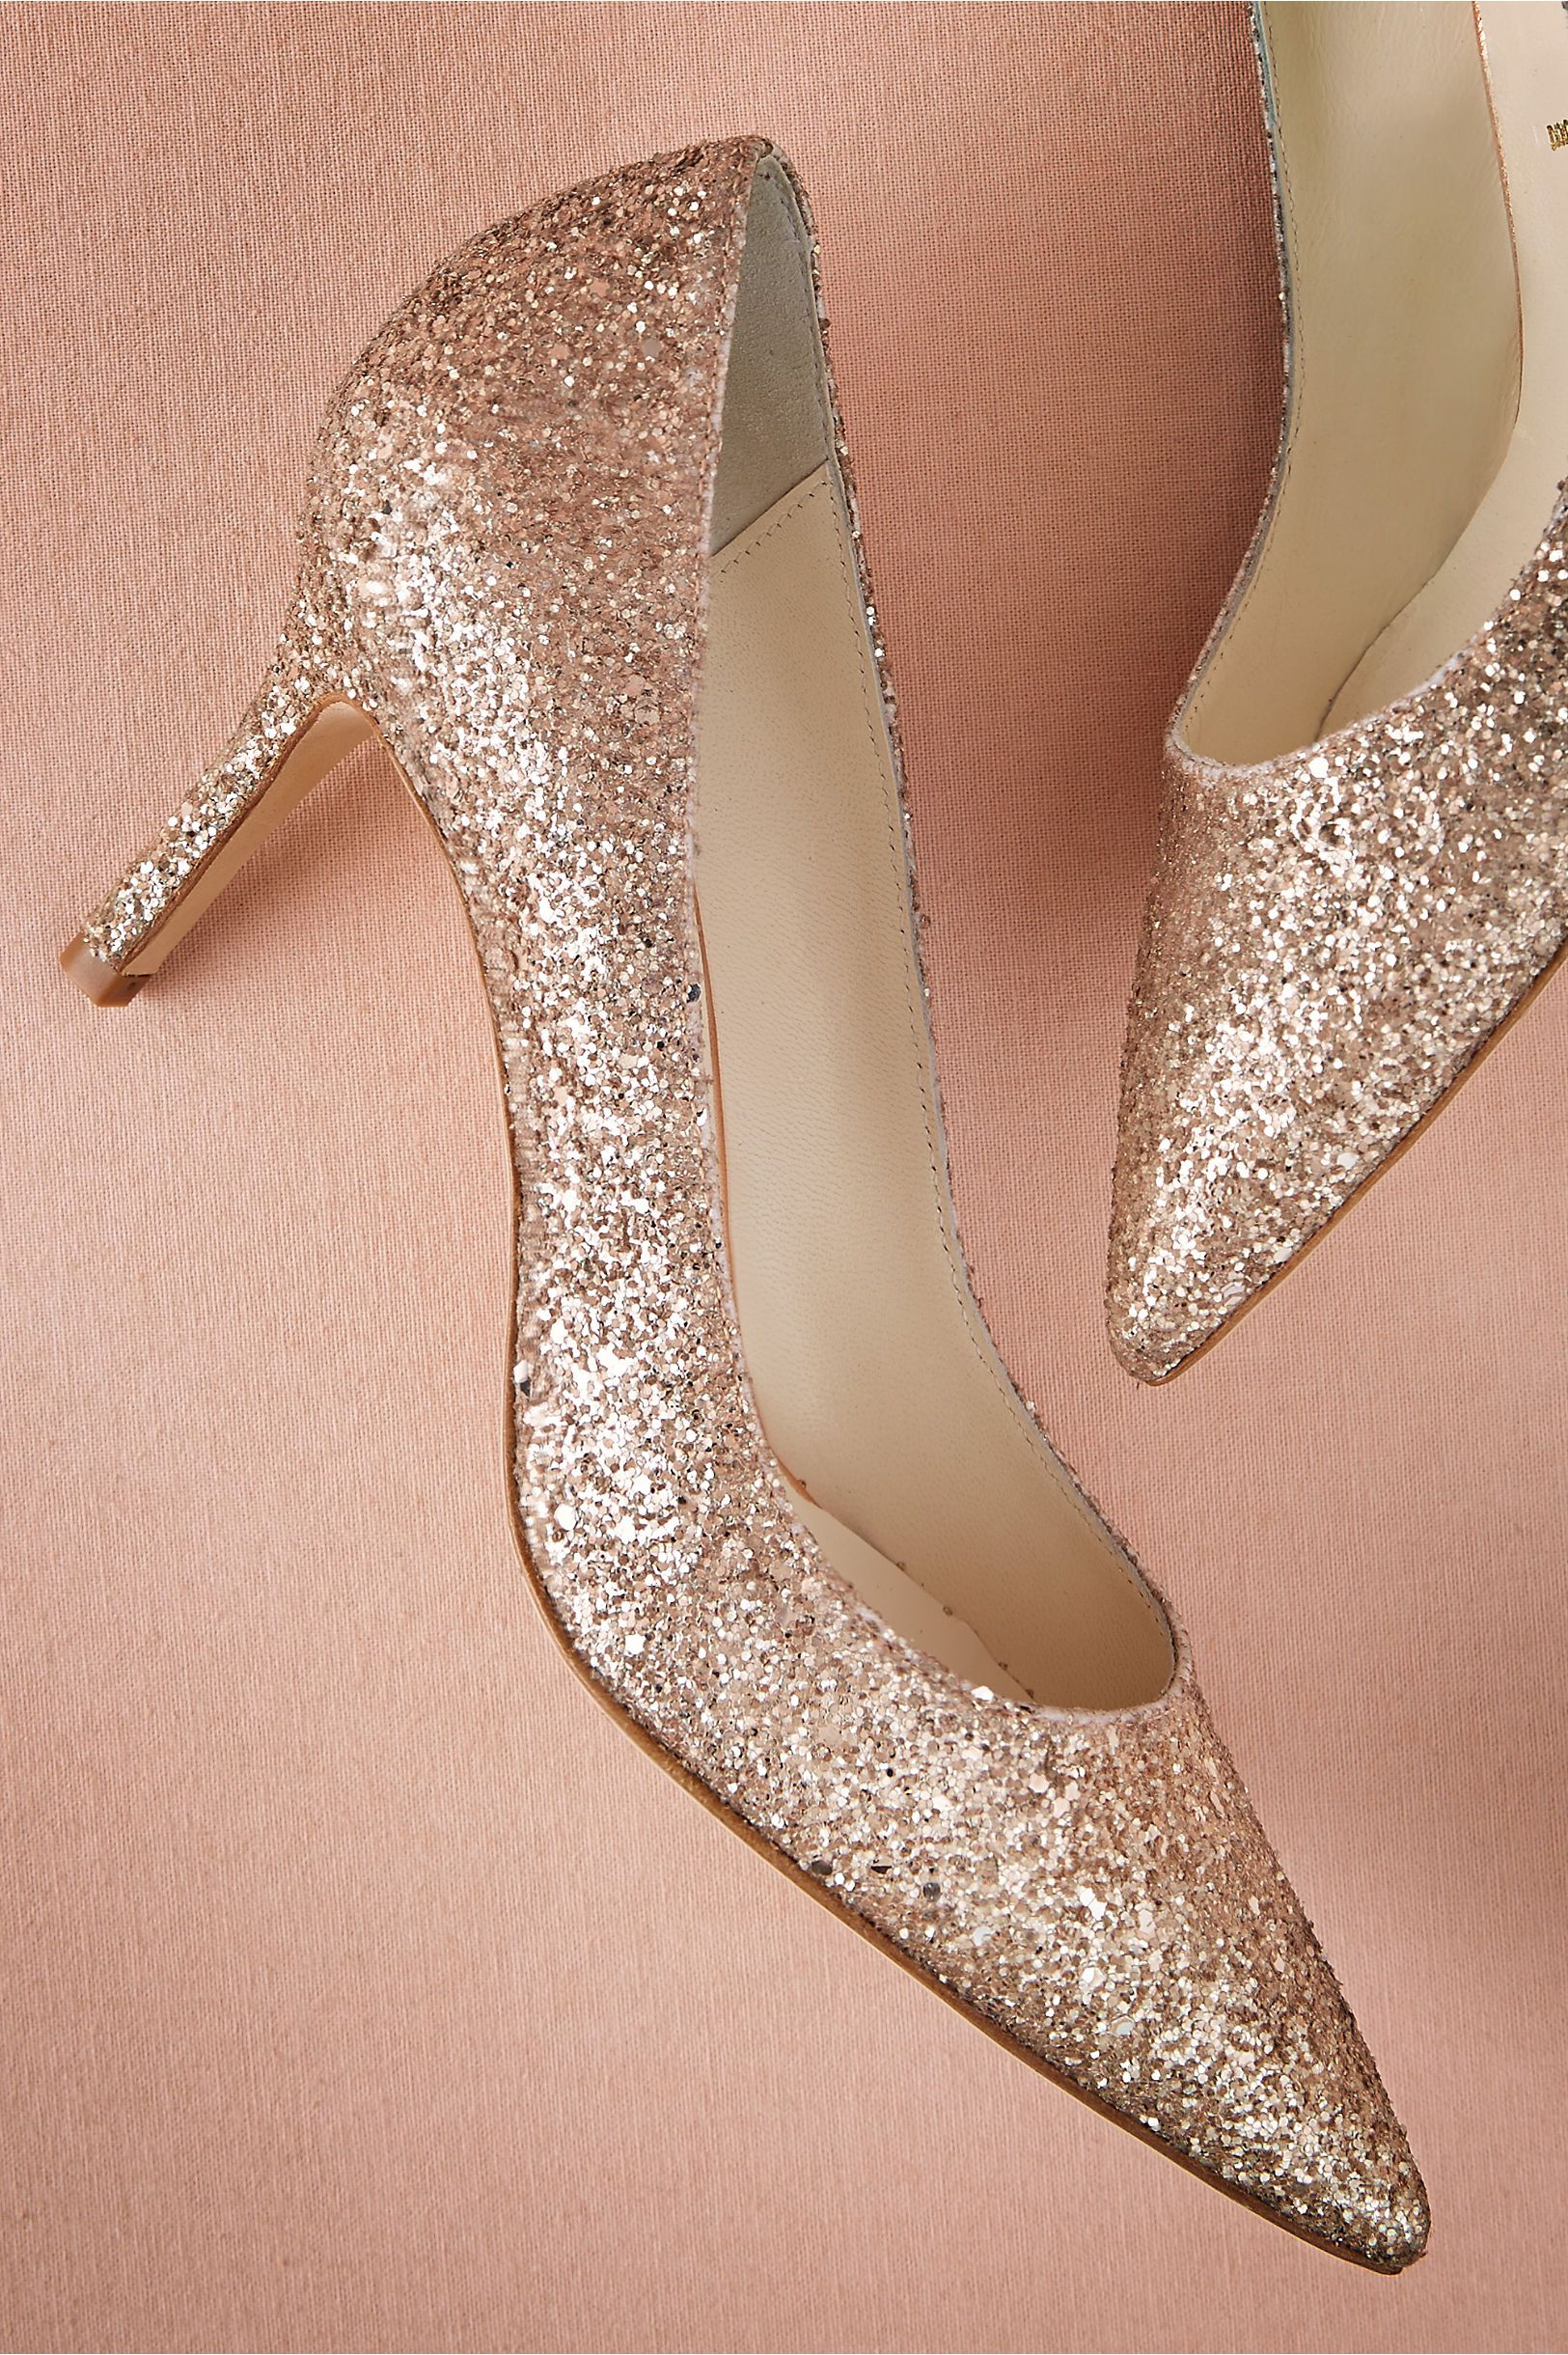 Vivacite Heels from BHLDN (=)